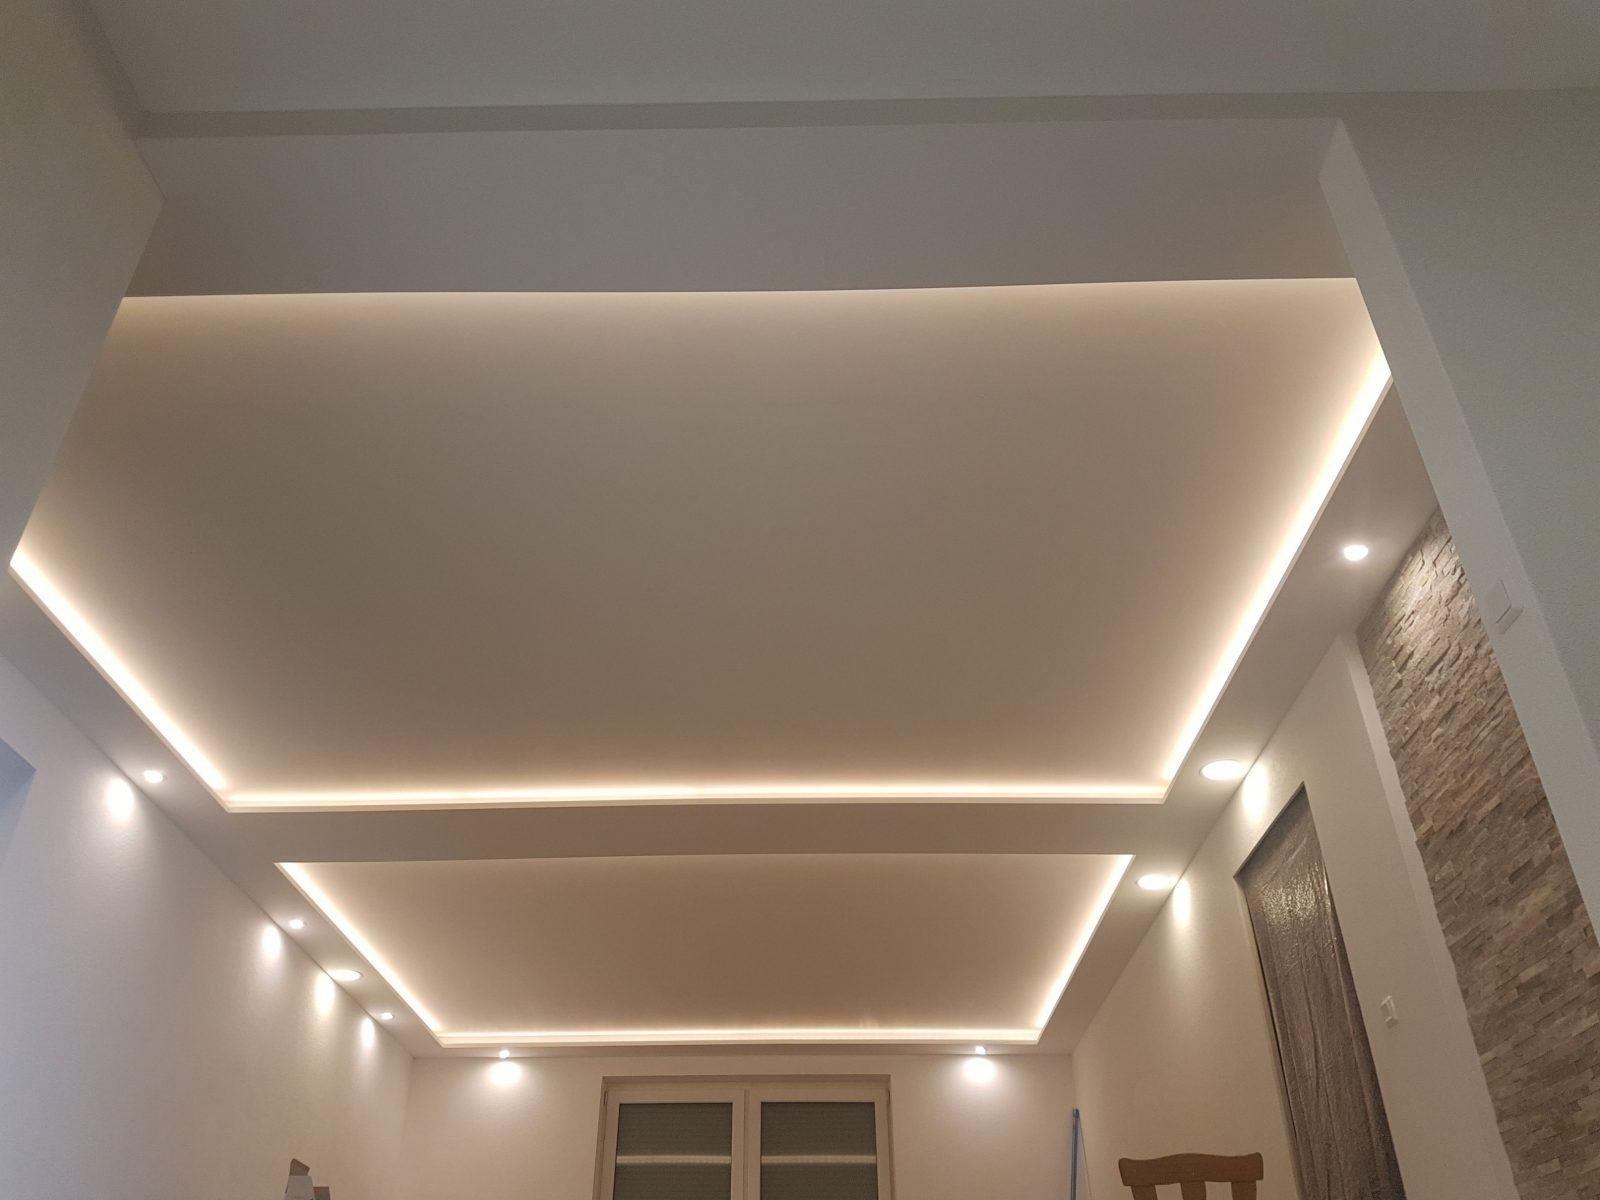 Indirekte Beleuchtung Bauanleitung Zum Selber Bauen  Best Of 12Do von Indirekte Beleuchtung Schlafzimmer Selber Bauen Photo